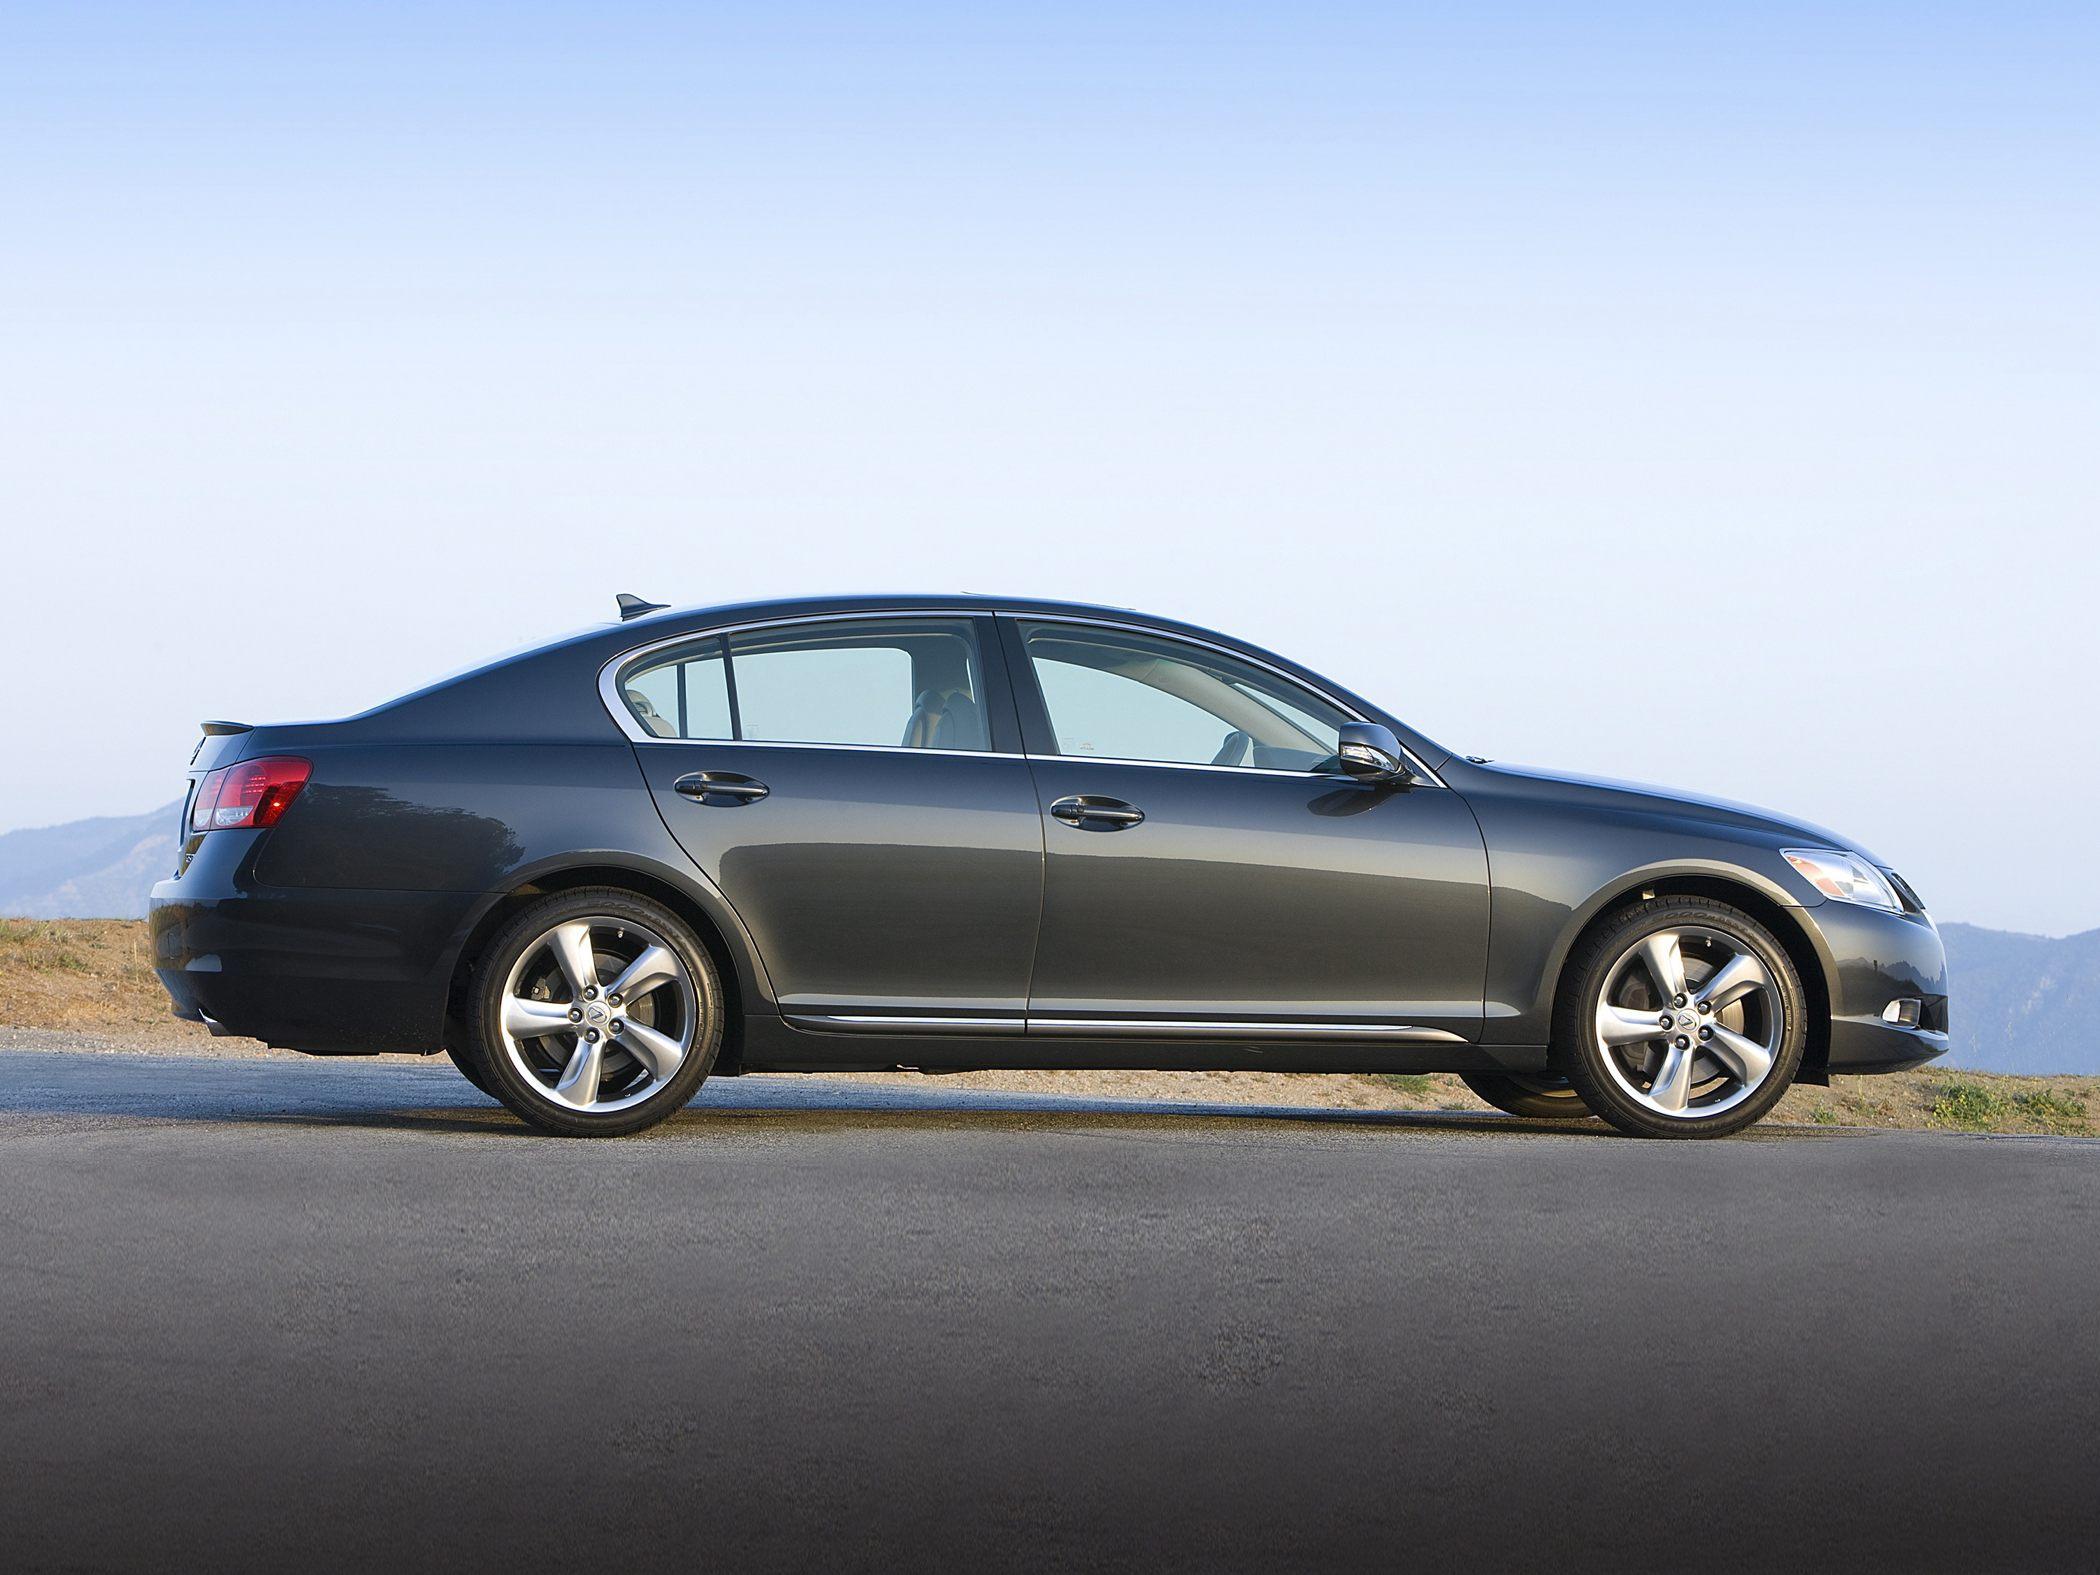 Lexus Is 350 >> 2011 LEXUS GS 350 - Image #19